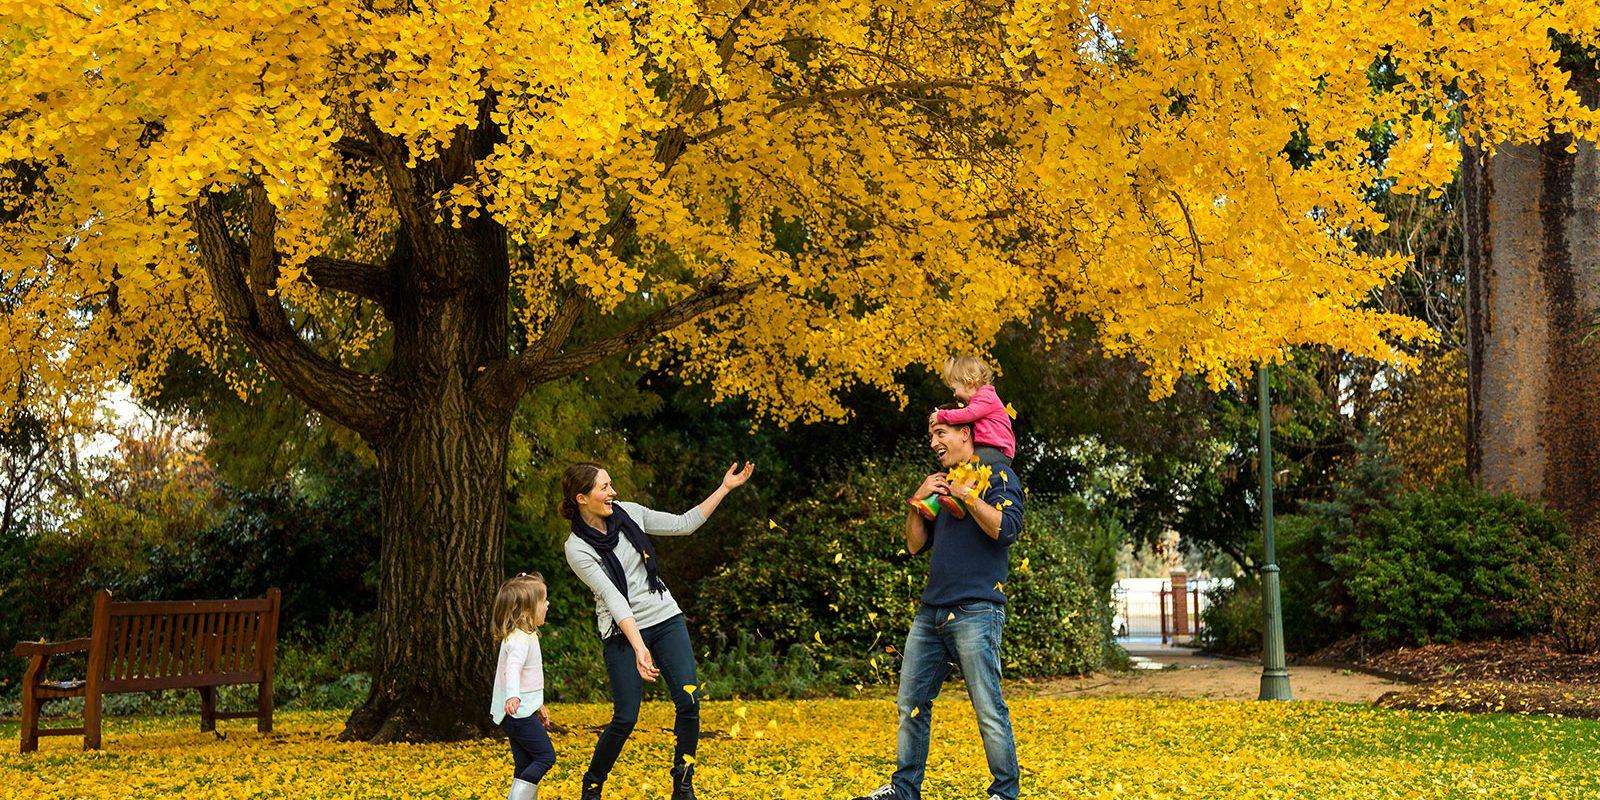 Autumn in the Albury Botanical Gardens